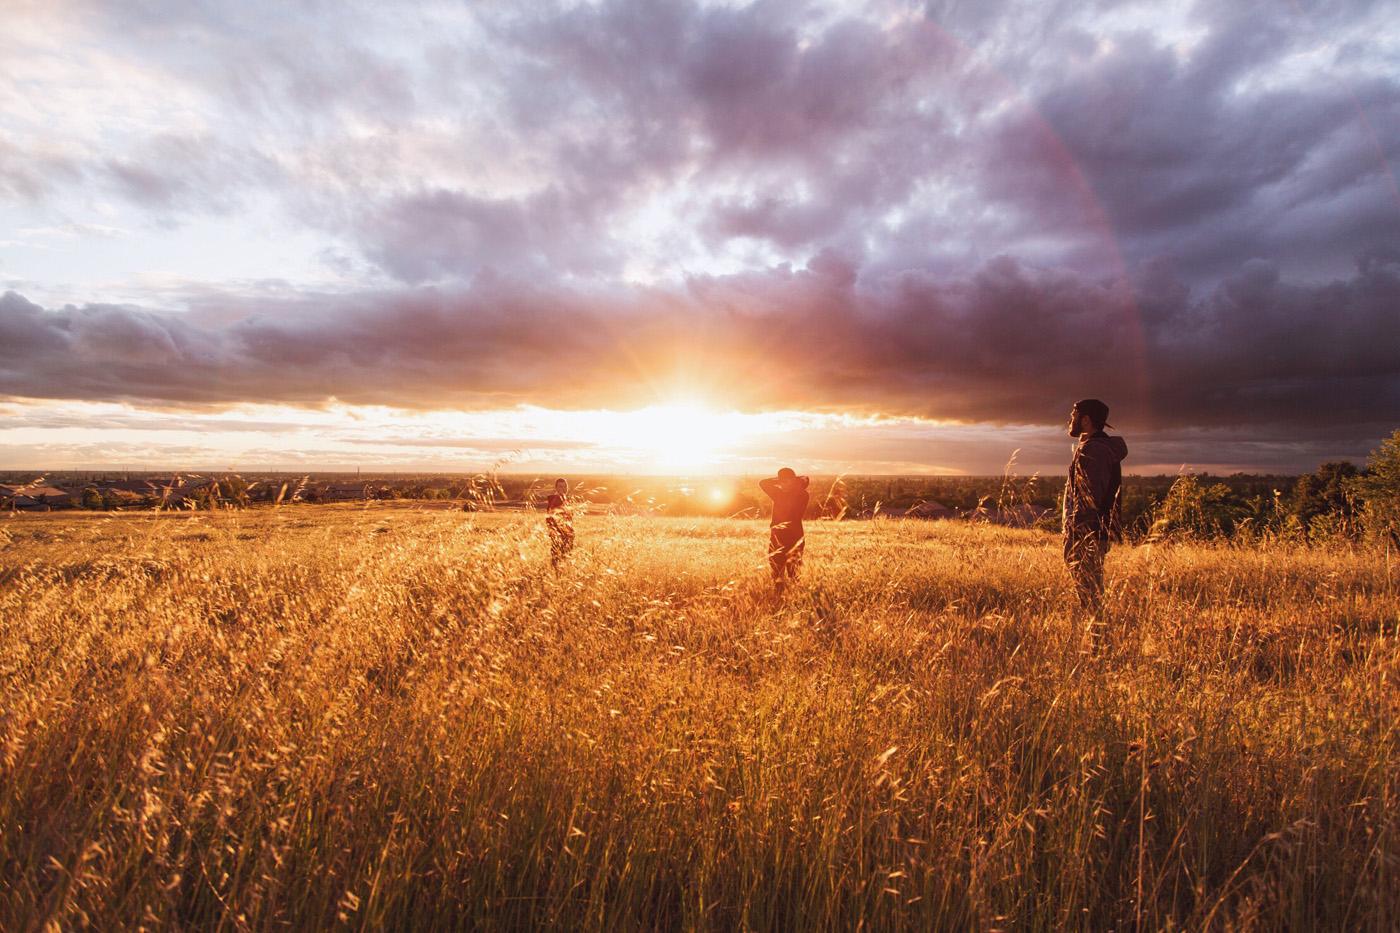 people_in_field_of_sun_low_res.jpg#asset